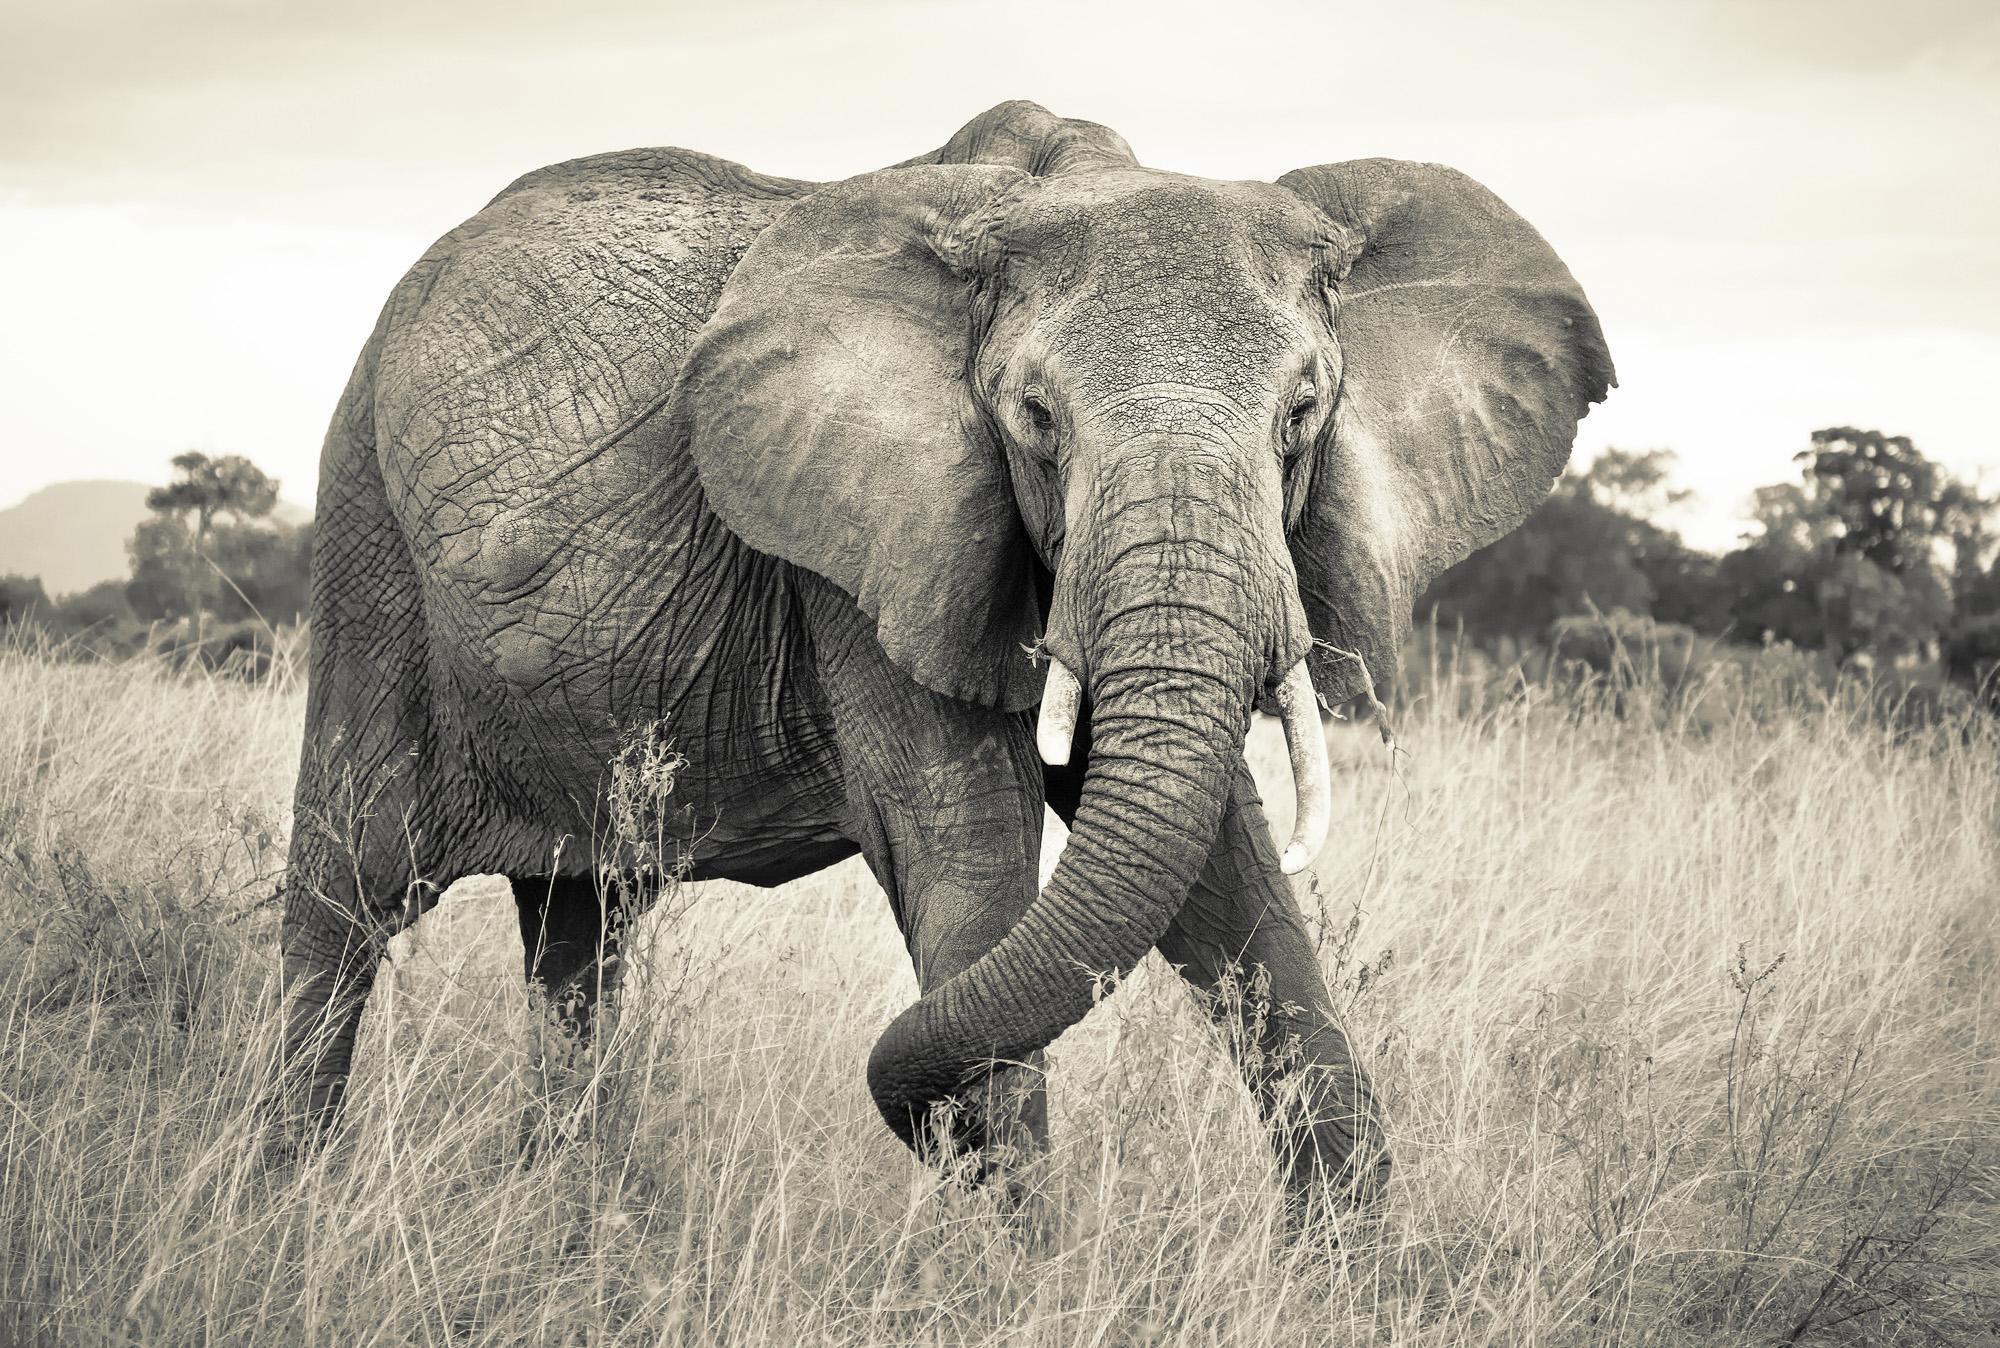 vliestapete elephant von national geographic. Black Bedroom Furniture Sets. Home Design Ideas